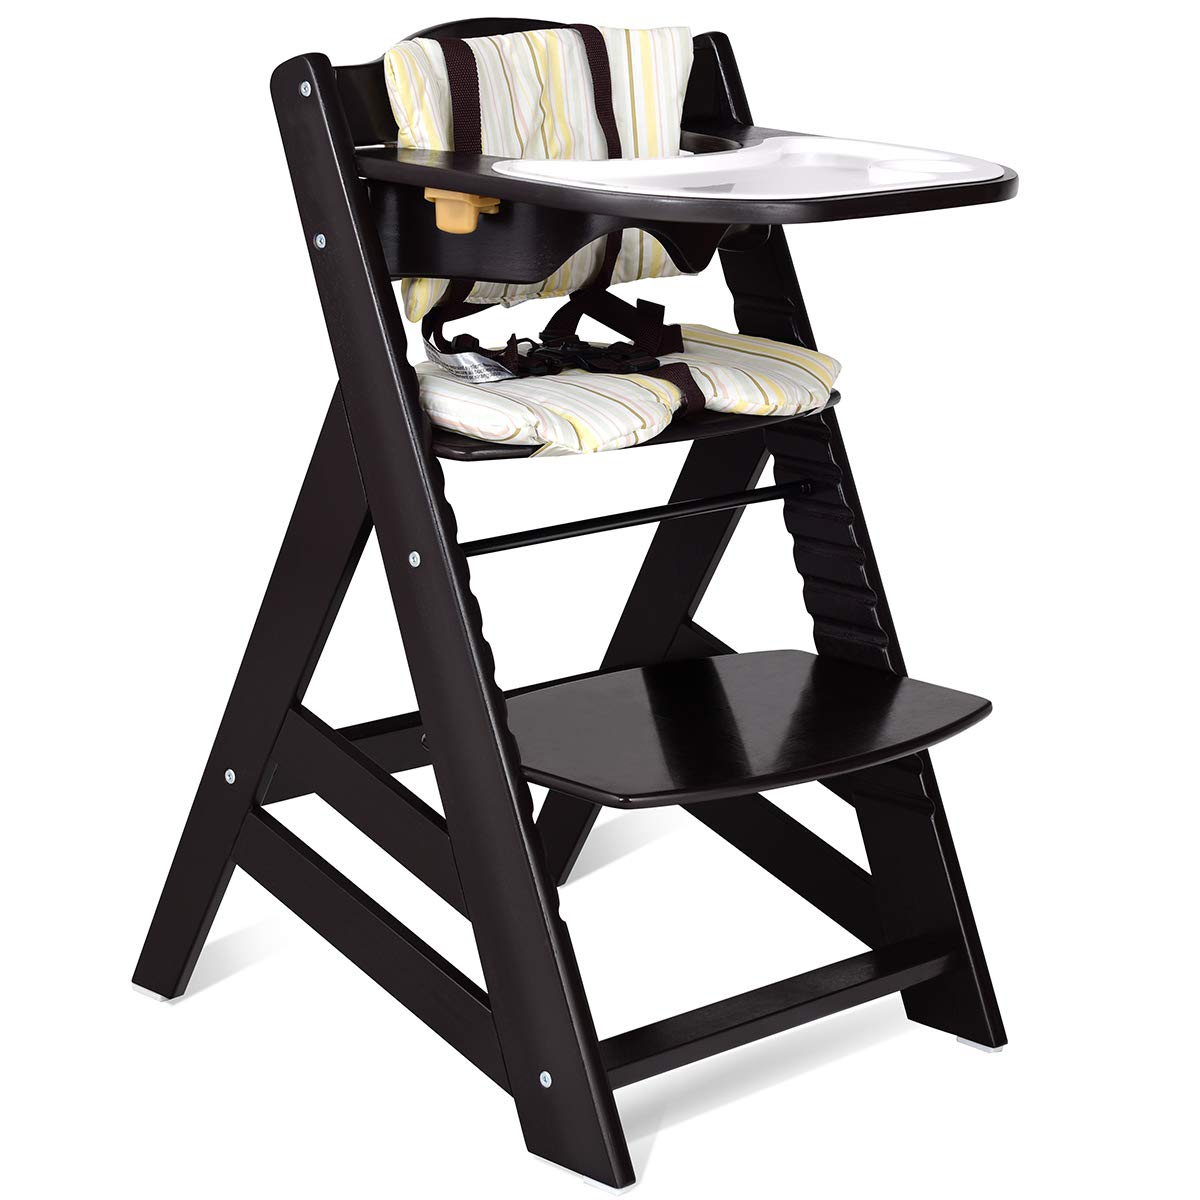 Sensational Amazon Com Liberory Child Dining Chair Infant Insert And Lamtechconsult Wood Chair Design Ideas Lamtechconsultcom